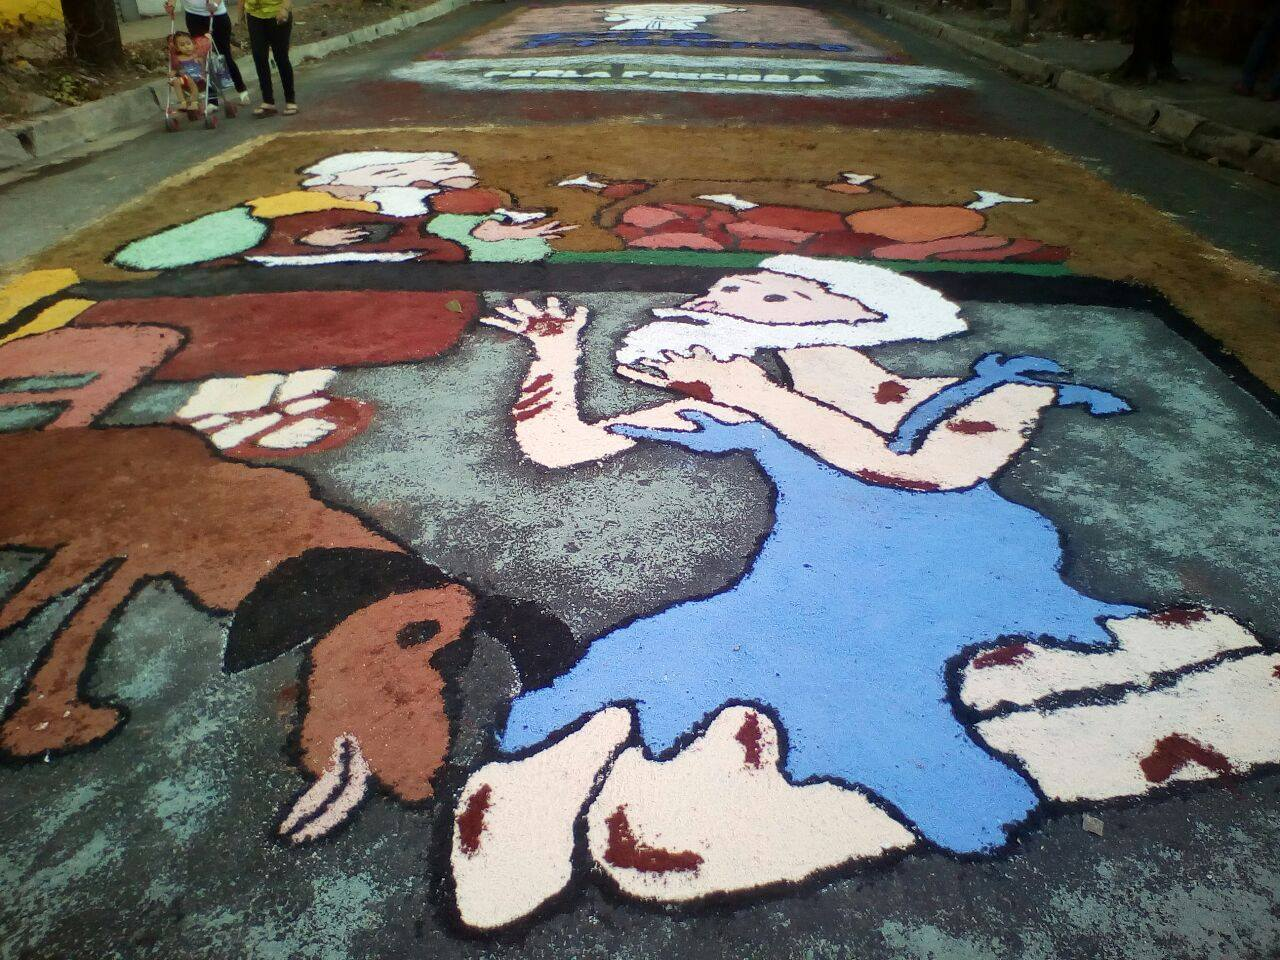 Feligreses católicos continúan con tradición de las alfombras